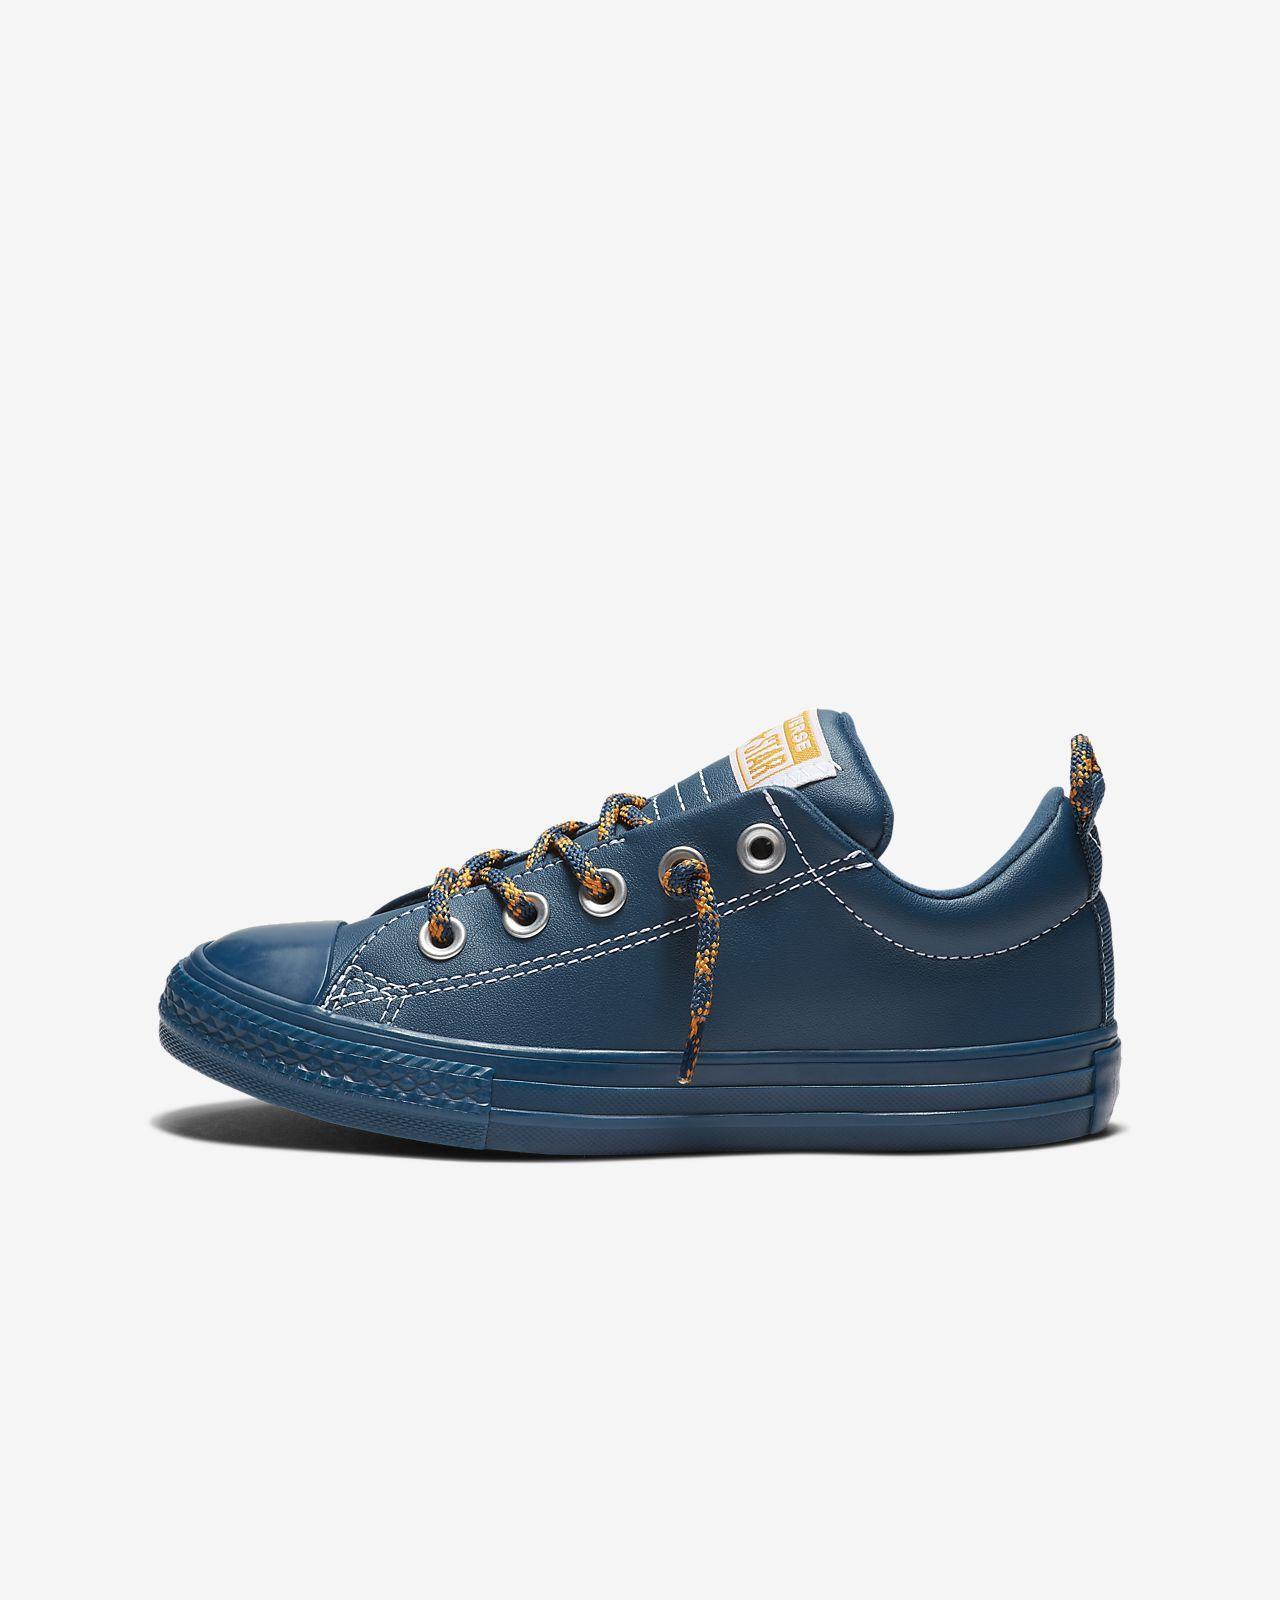 181343deba9122 Converse Chuck Taylor All Star Street Hiker Leather Slip Big Kids  Shoe